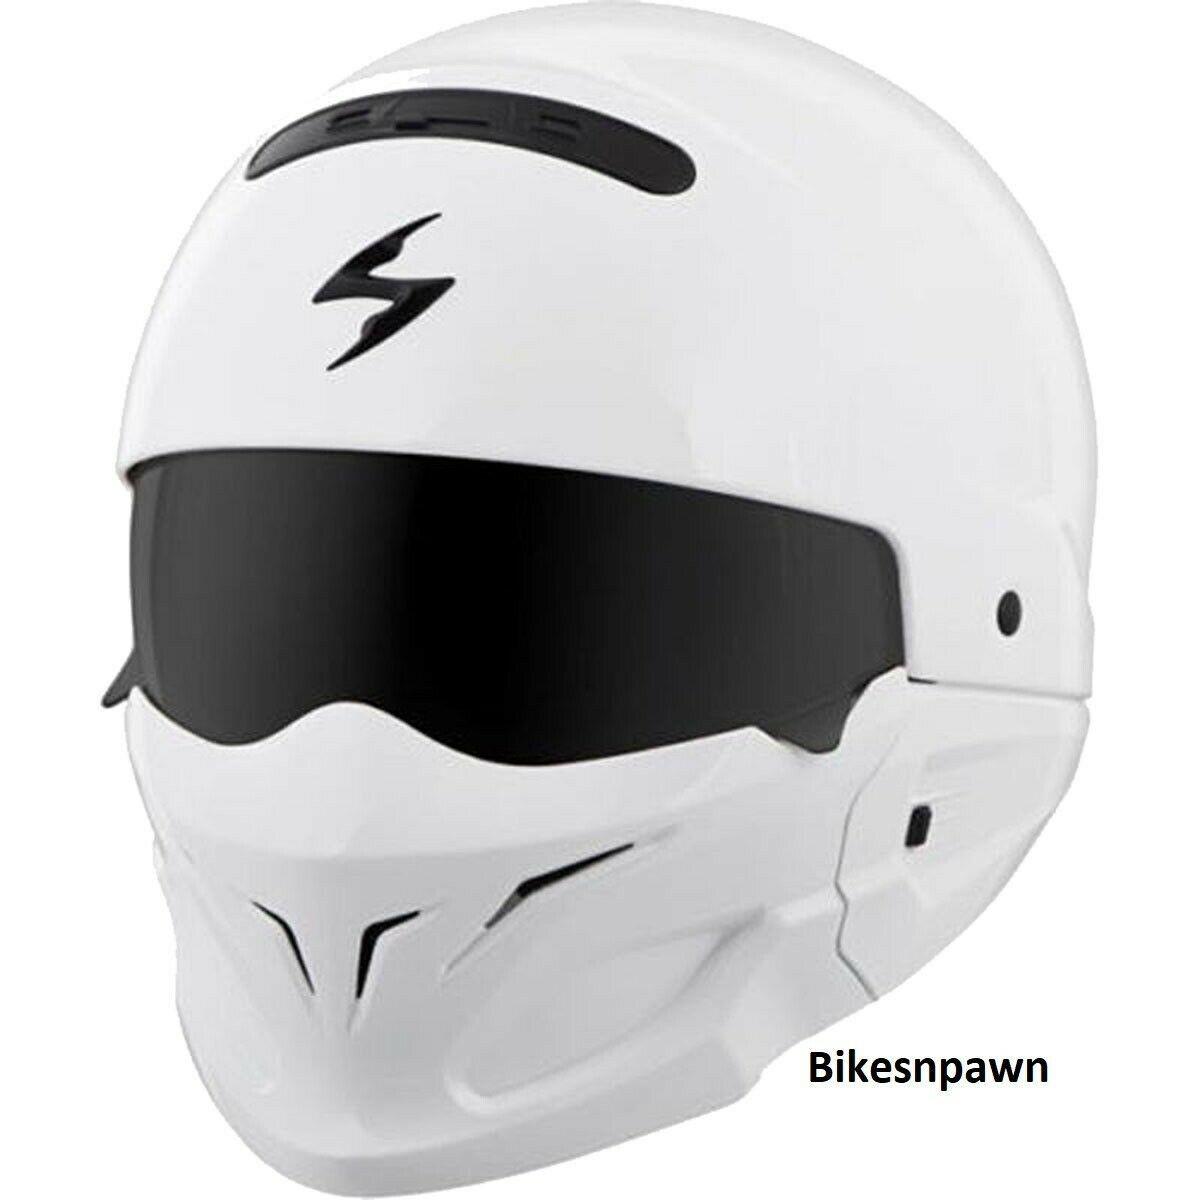 New Size L Scorpion EXO Covert White 3 in 1 Motorcycle Helmet DOT